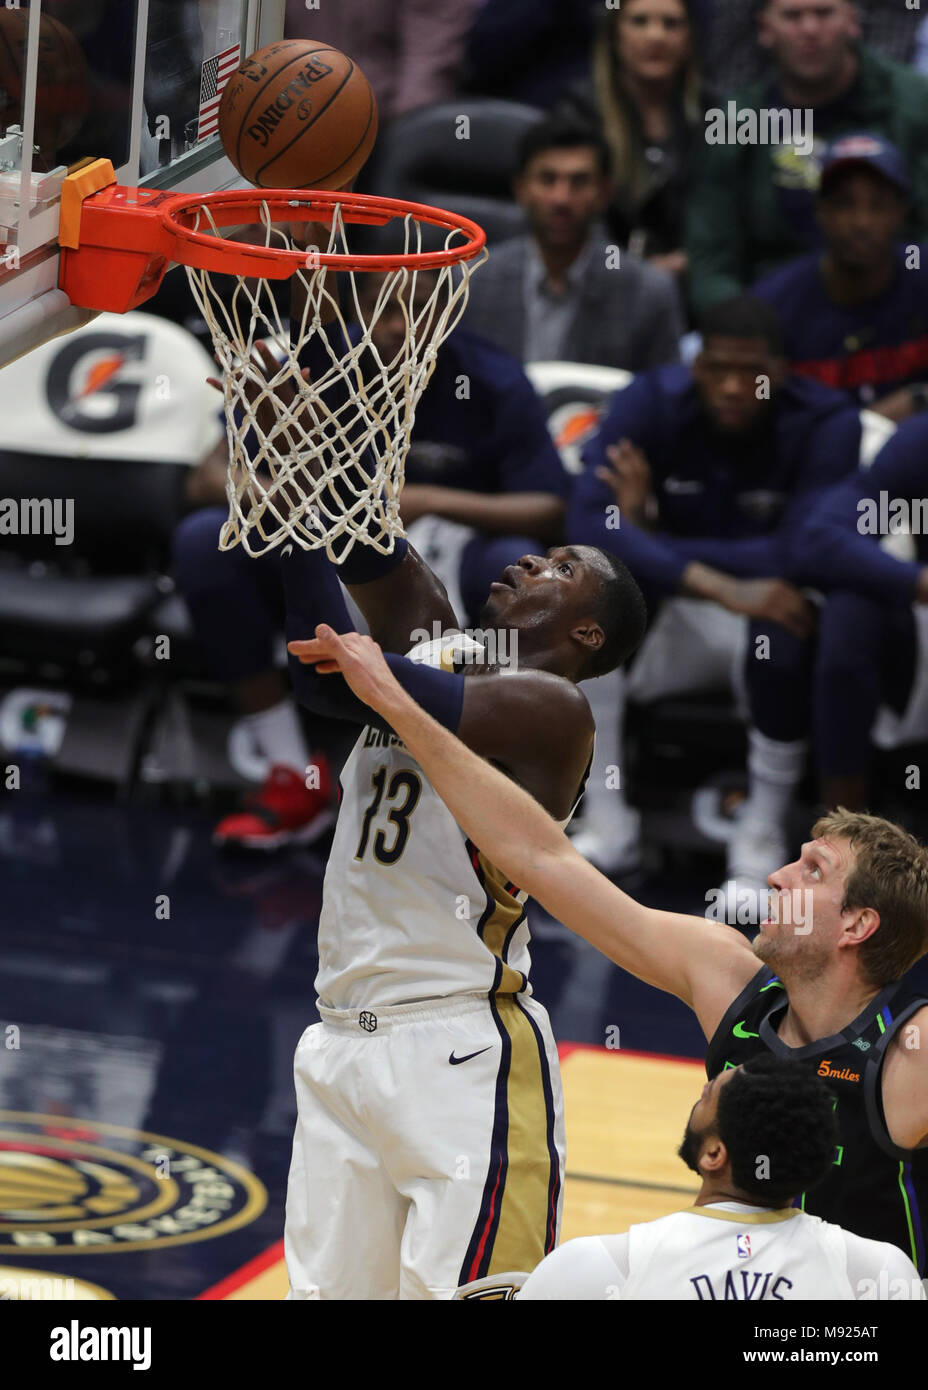 New Orleans, LA, USA  20th Mar, 2018  New Orleans Pelicans